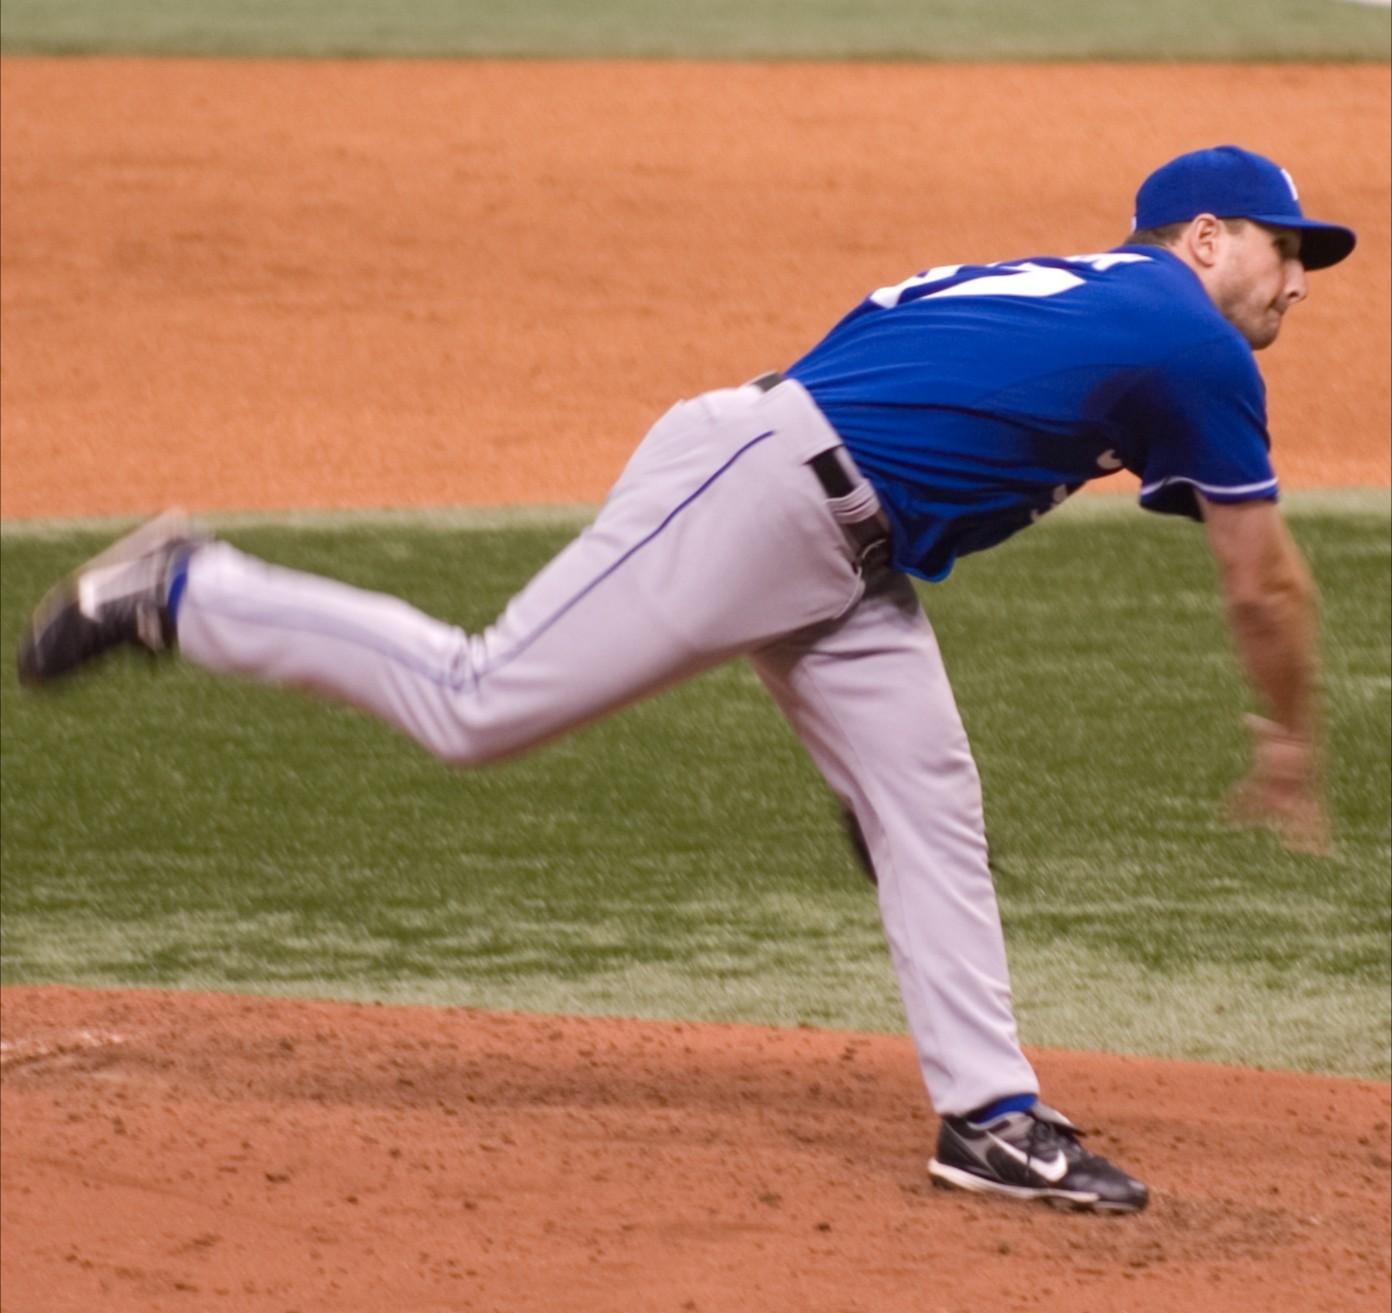 Ryan Braun Pitcher Wikipedia